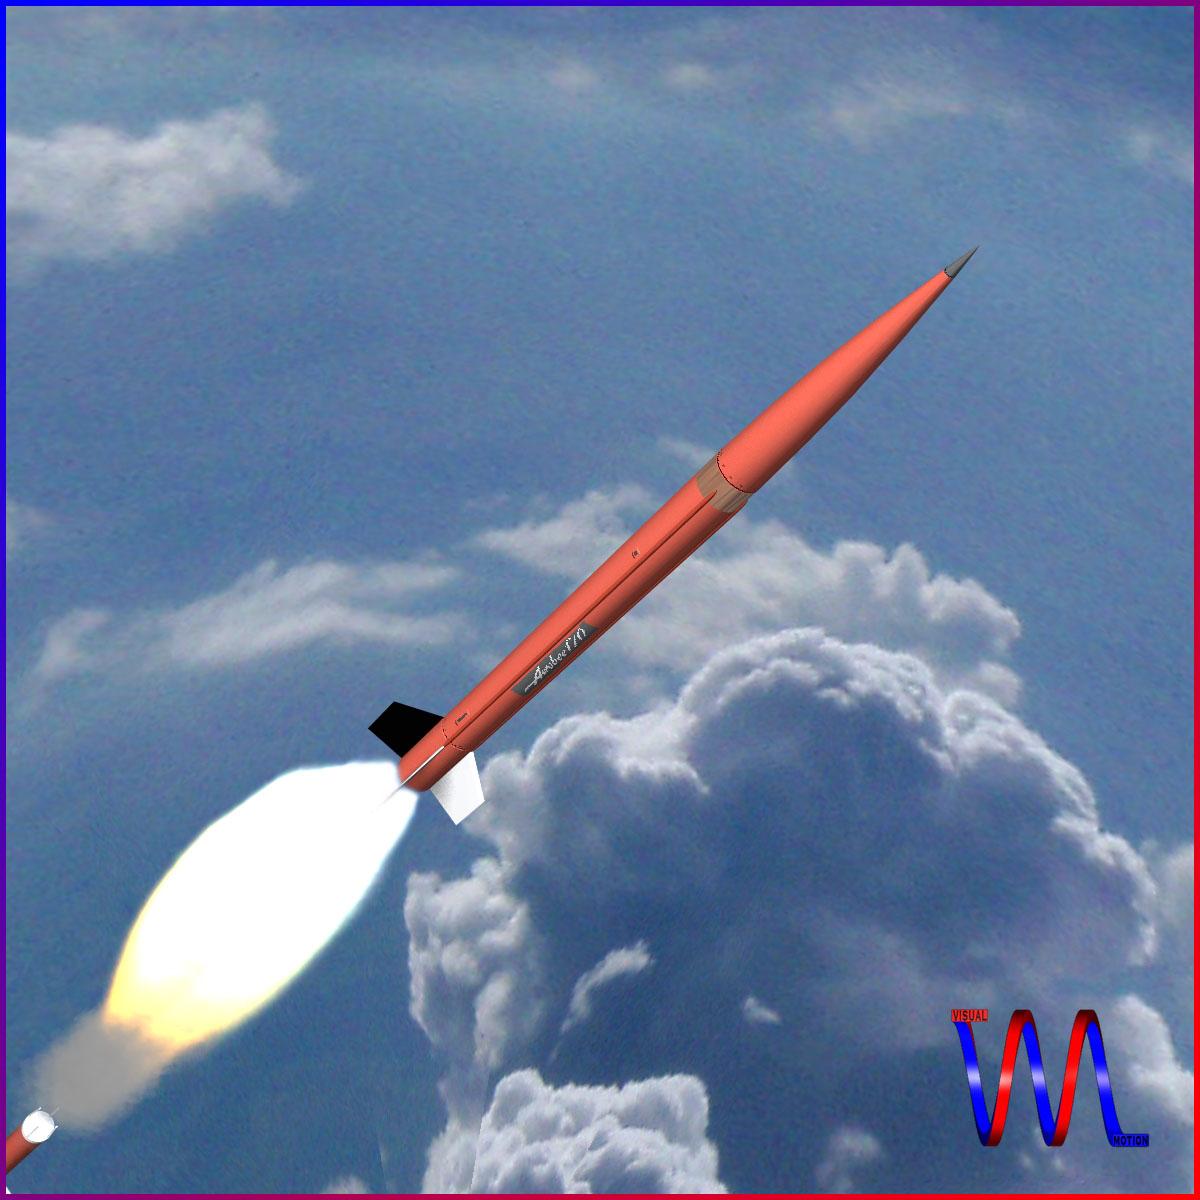 aerobee 170 rocket 3d model 3ds dxf fbx blend cob dae x  obj 166036